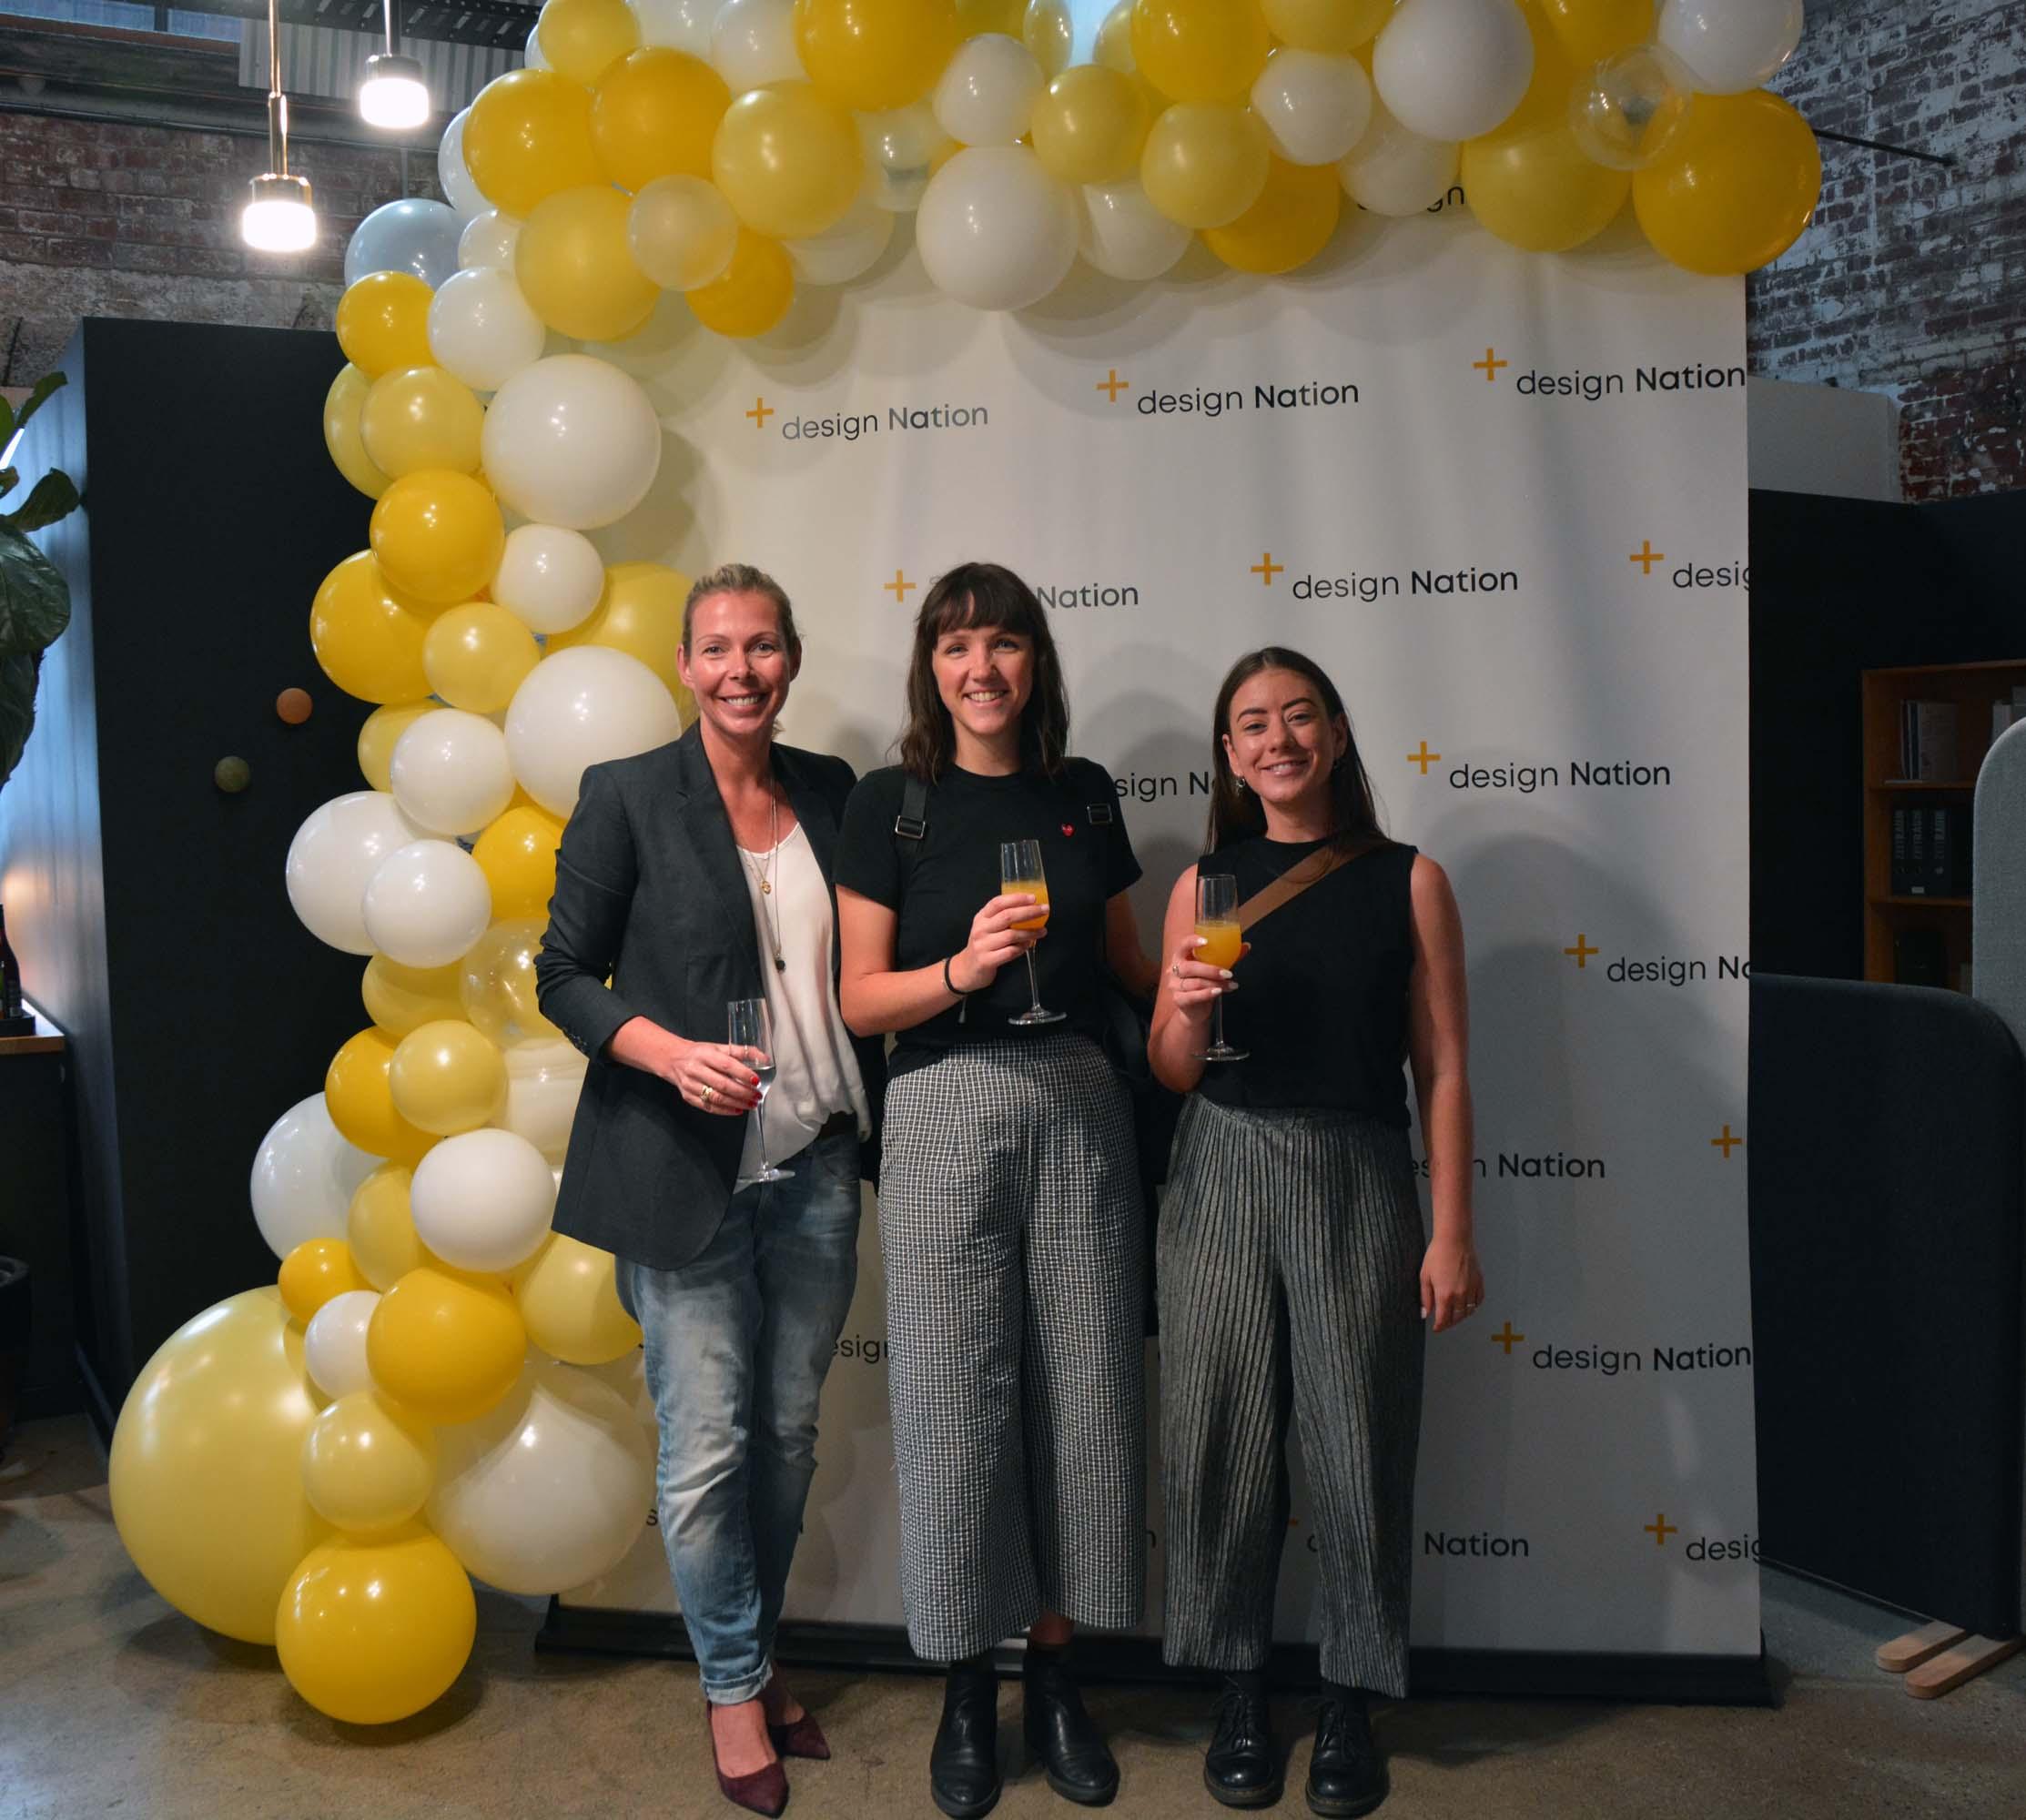 DNA_Melbourne_Launch_event (4)